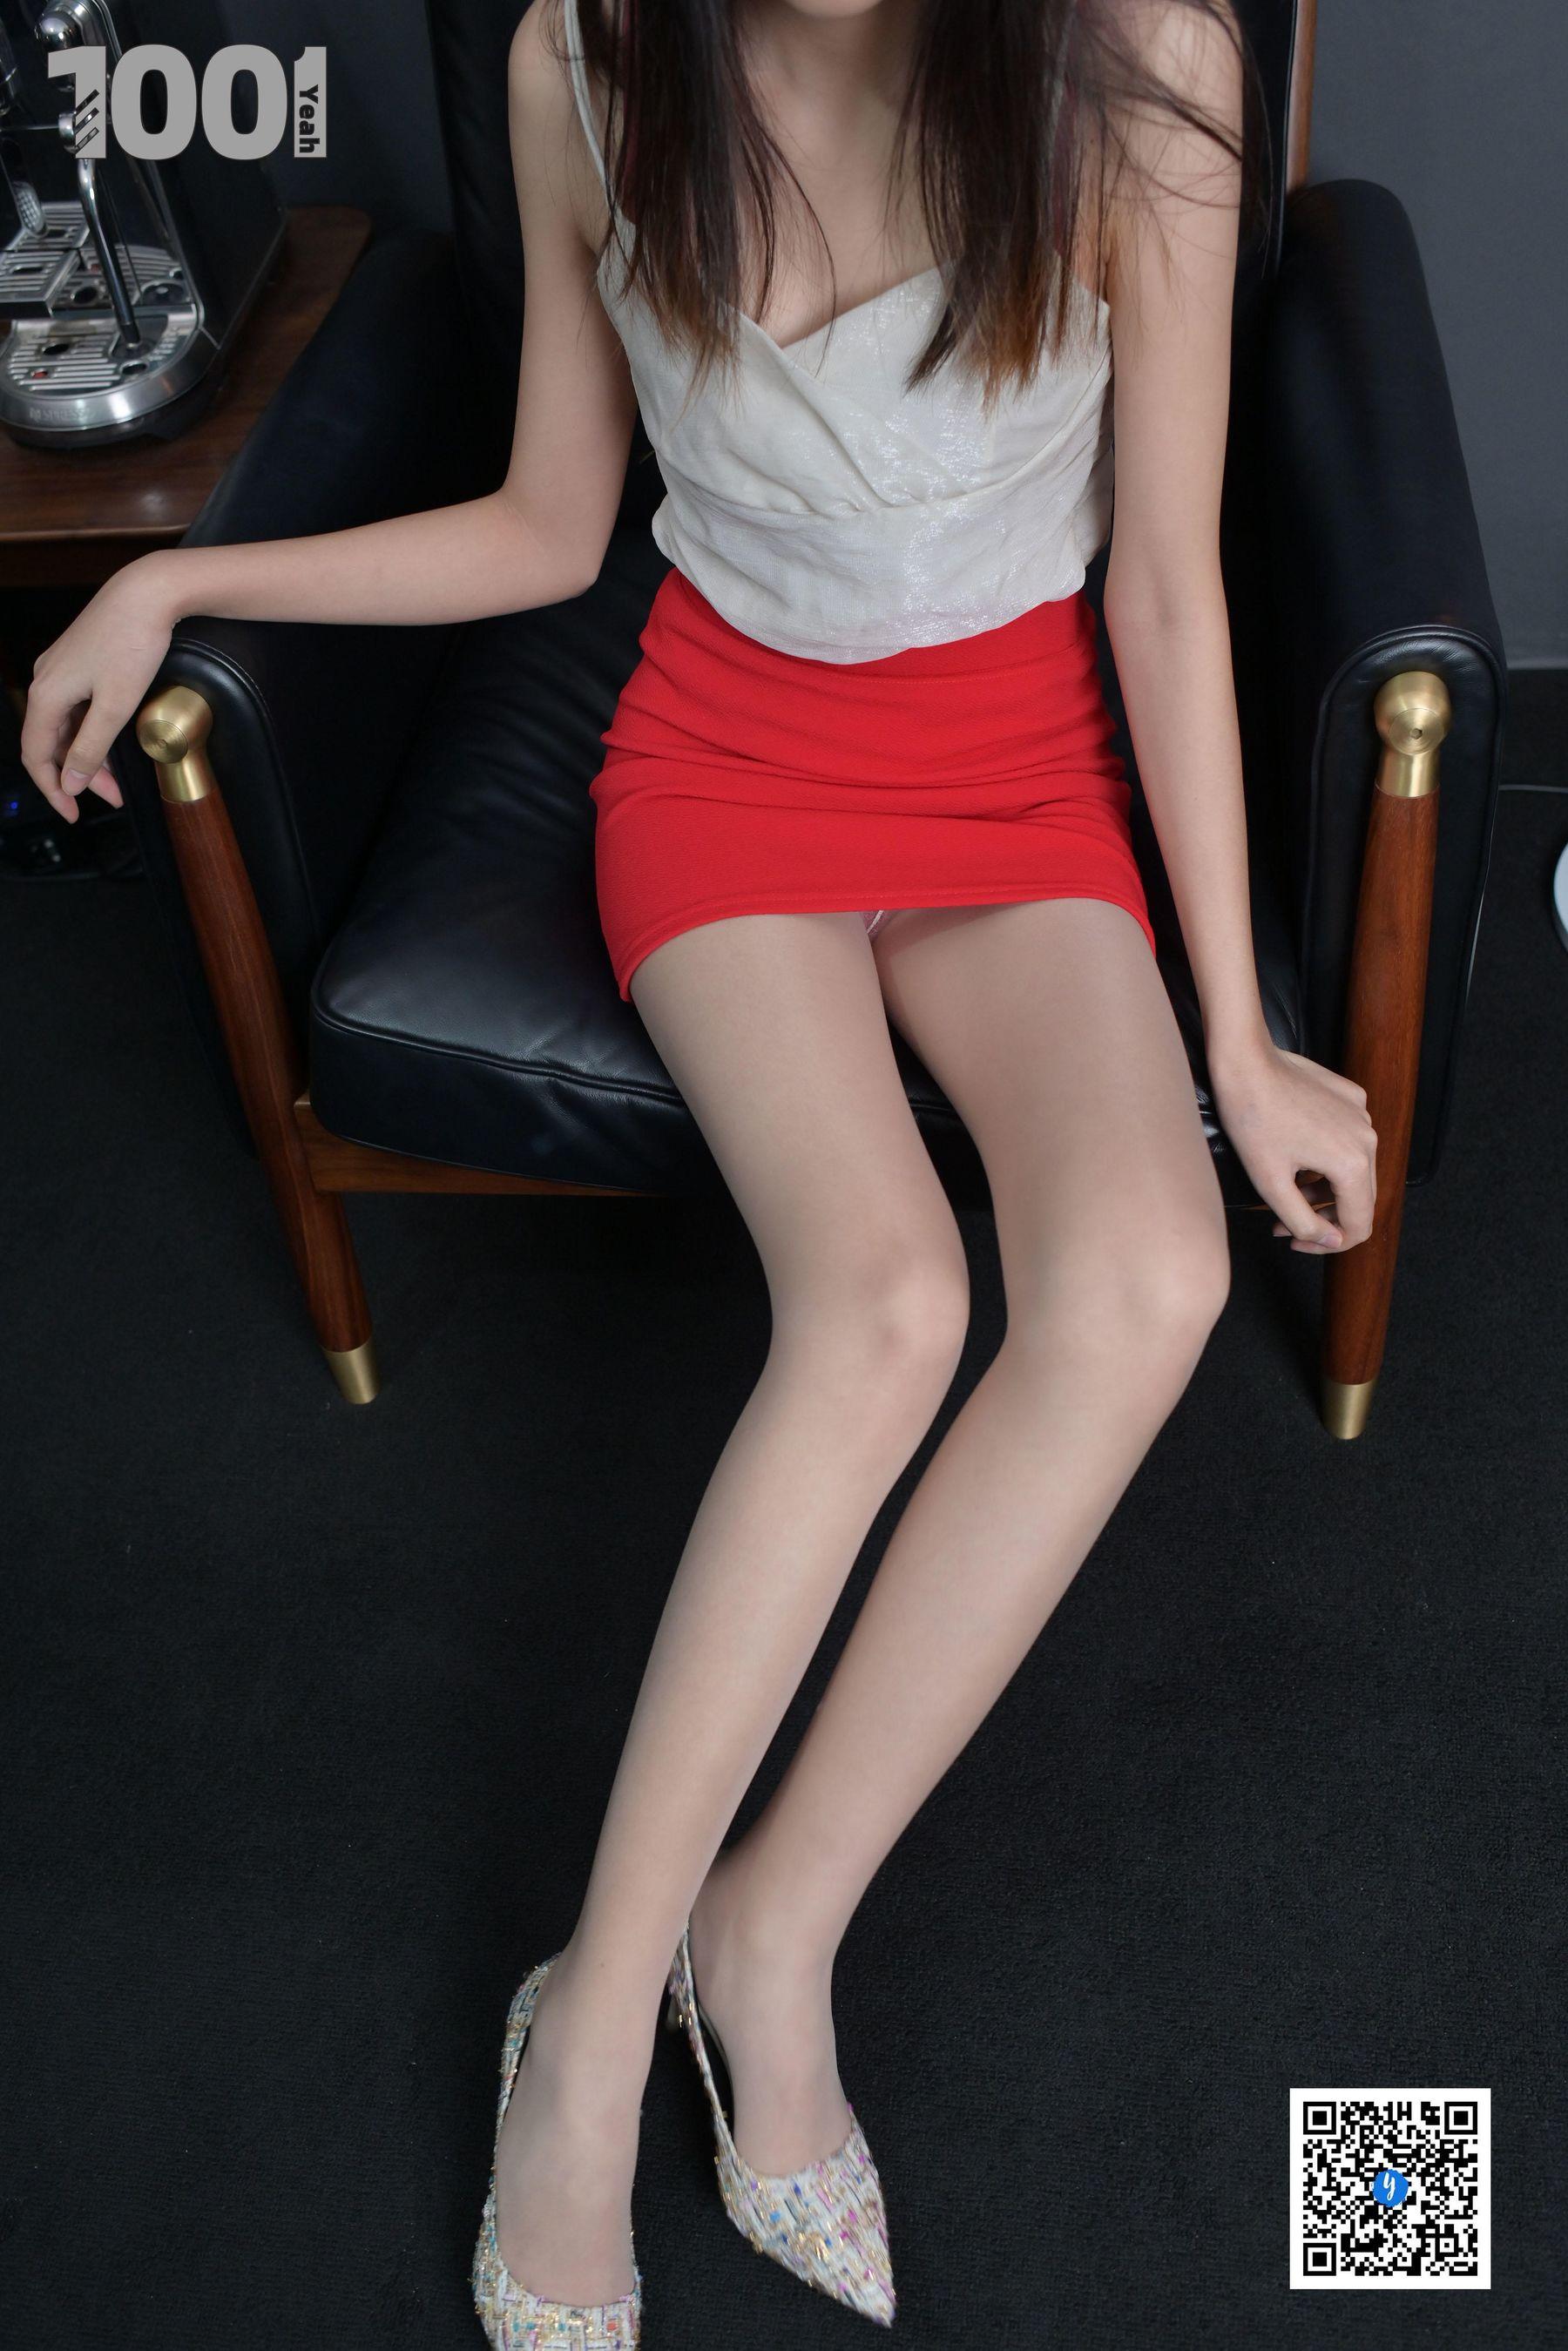 VOL.1032 [异思趣向]肉丝美腿:匿名超高清写真套图(87P)